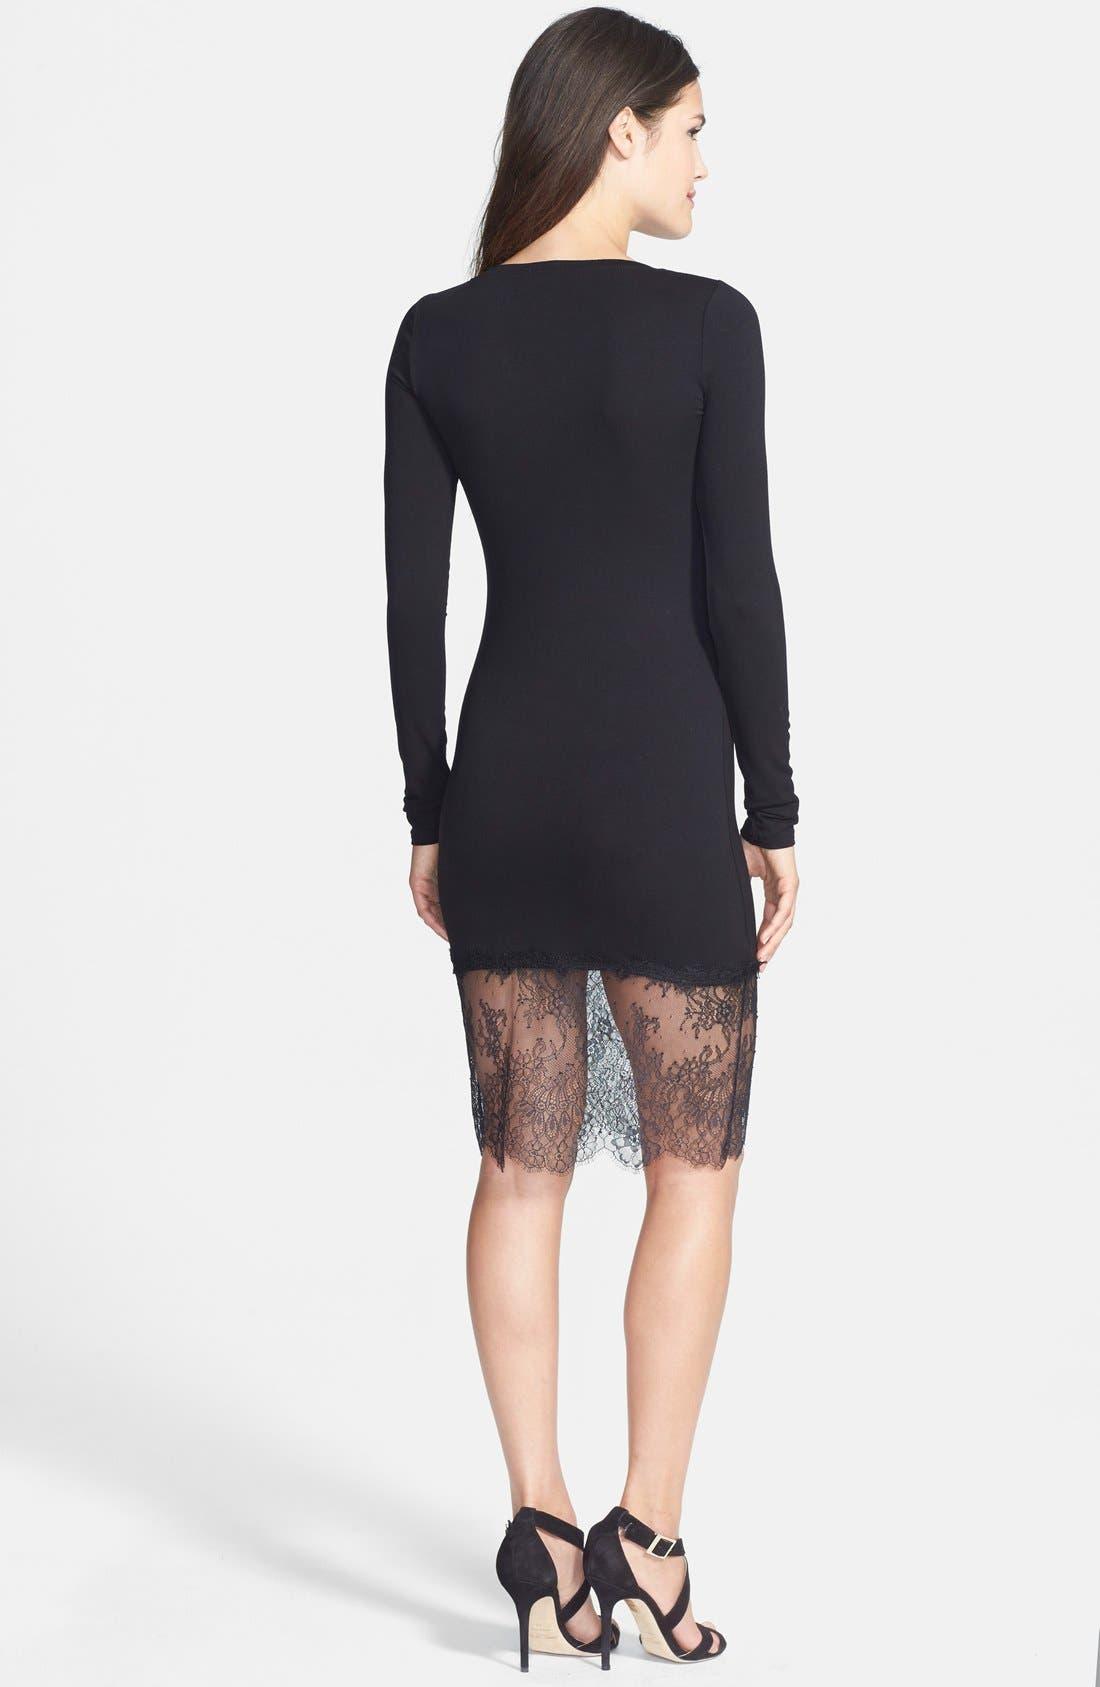 BCBGMAXAZRIA, 'Livi' Lace & Jersey Knit Sheath Dress, Alternate thumbnail 2, color, 001